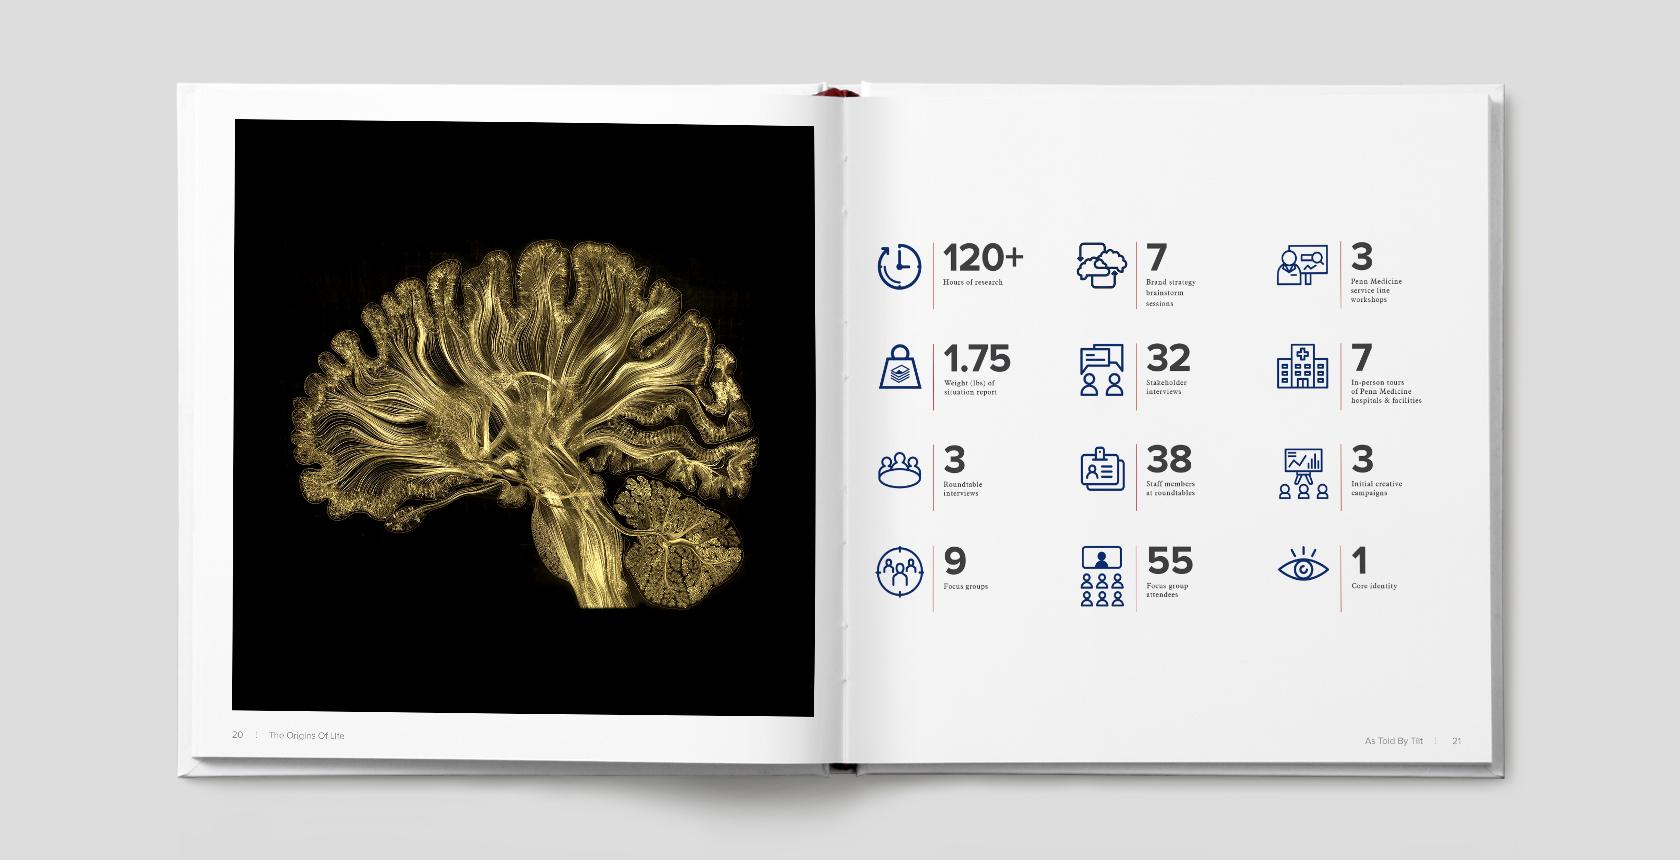 Penn_Medicine_Image_Gallery_Life_Book_2.jpg